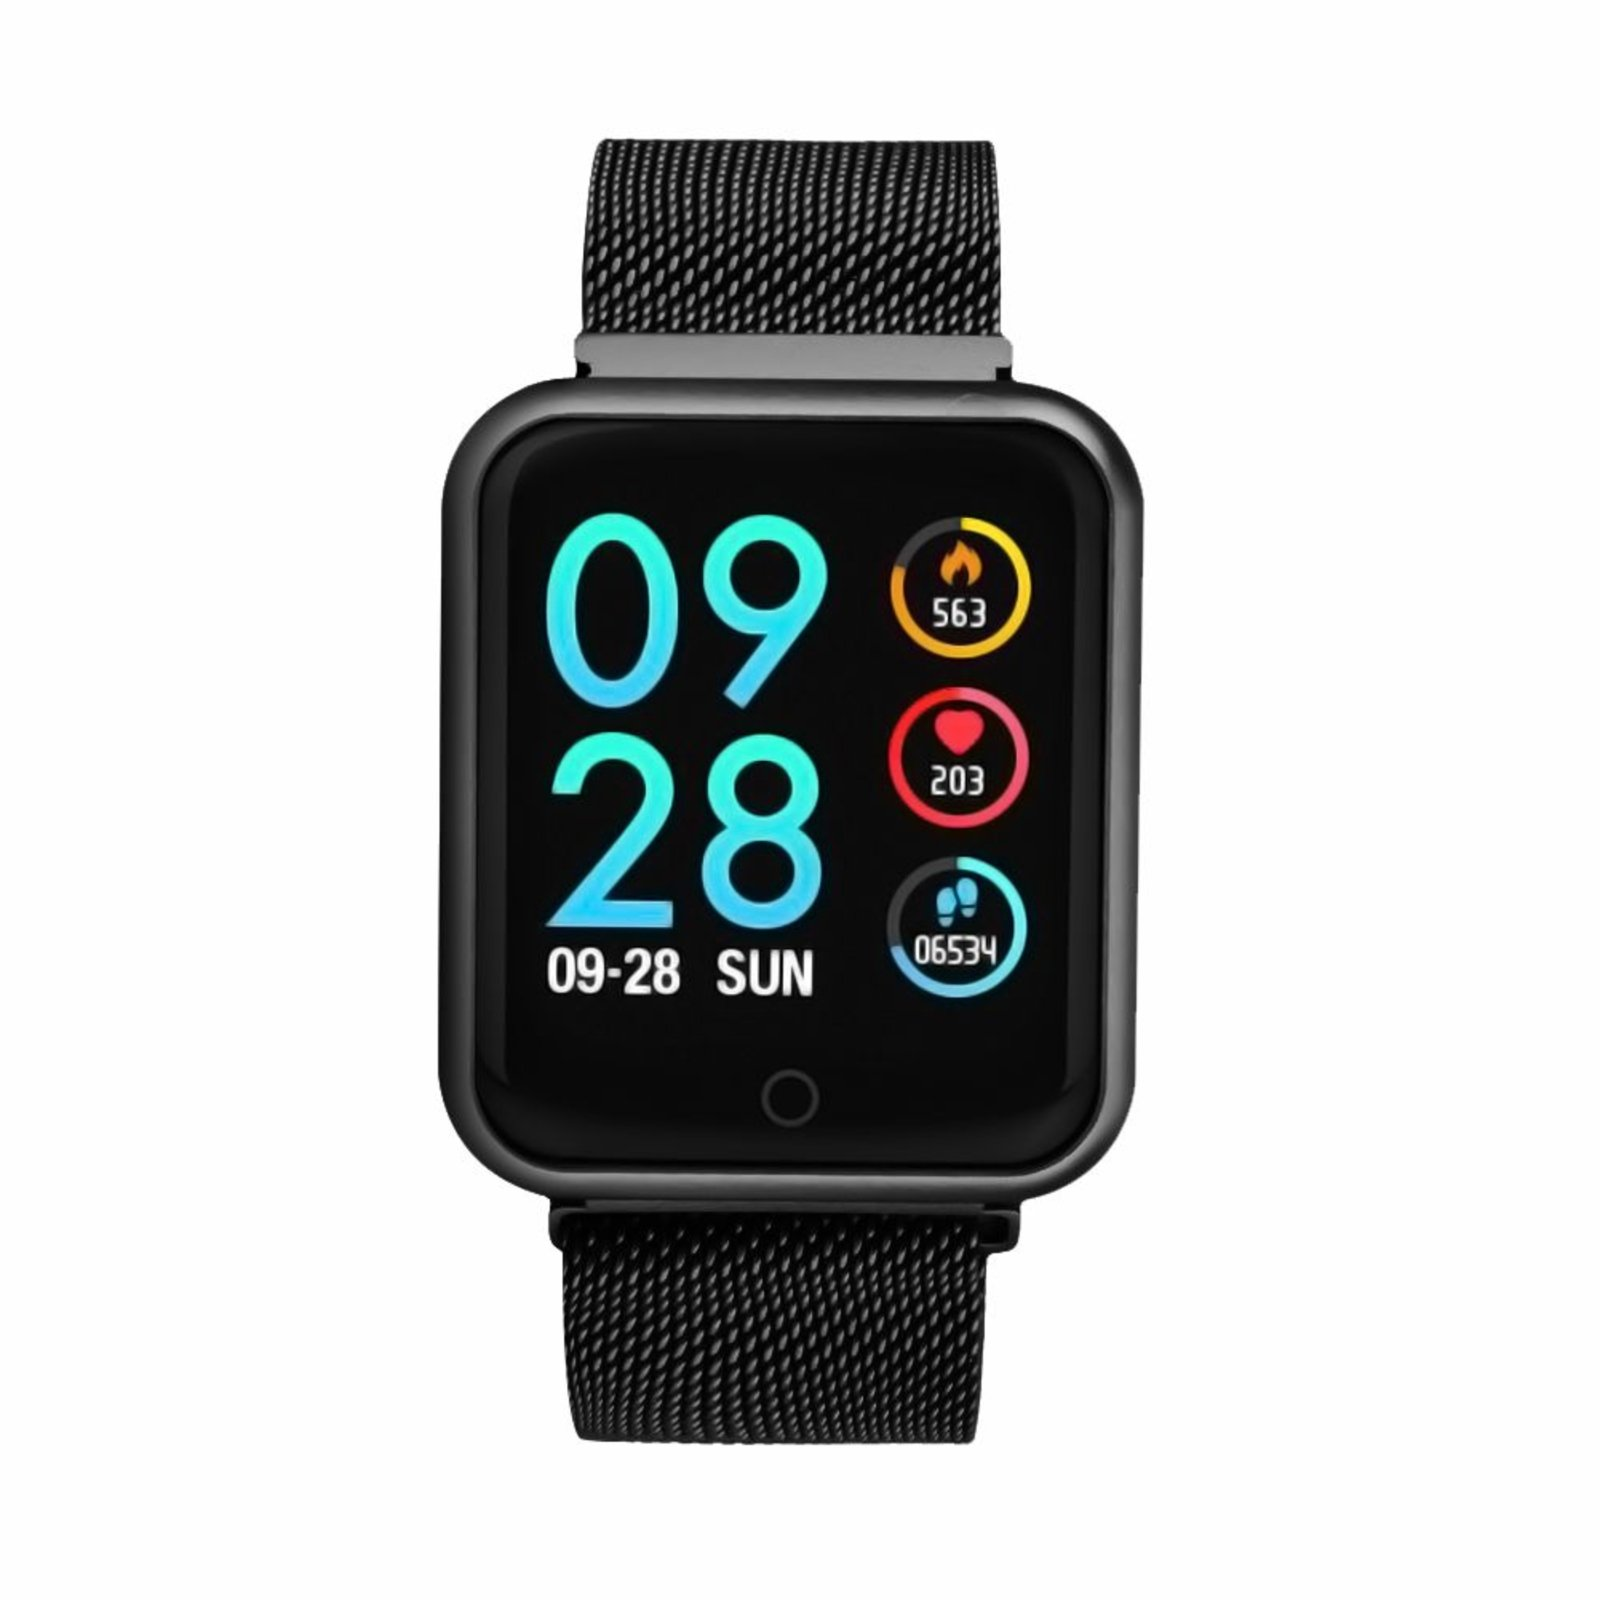 Rélogio Xtrad Smartwach Inteligente Pedômetro Premium - iOS e Android - Preto - Compre Agora